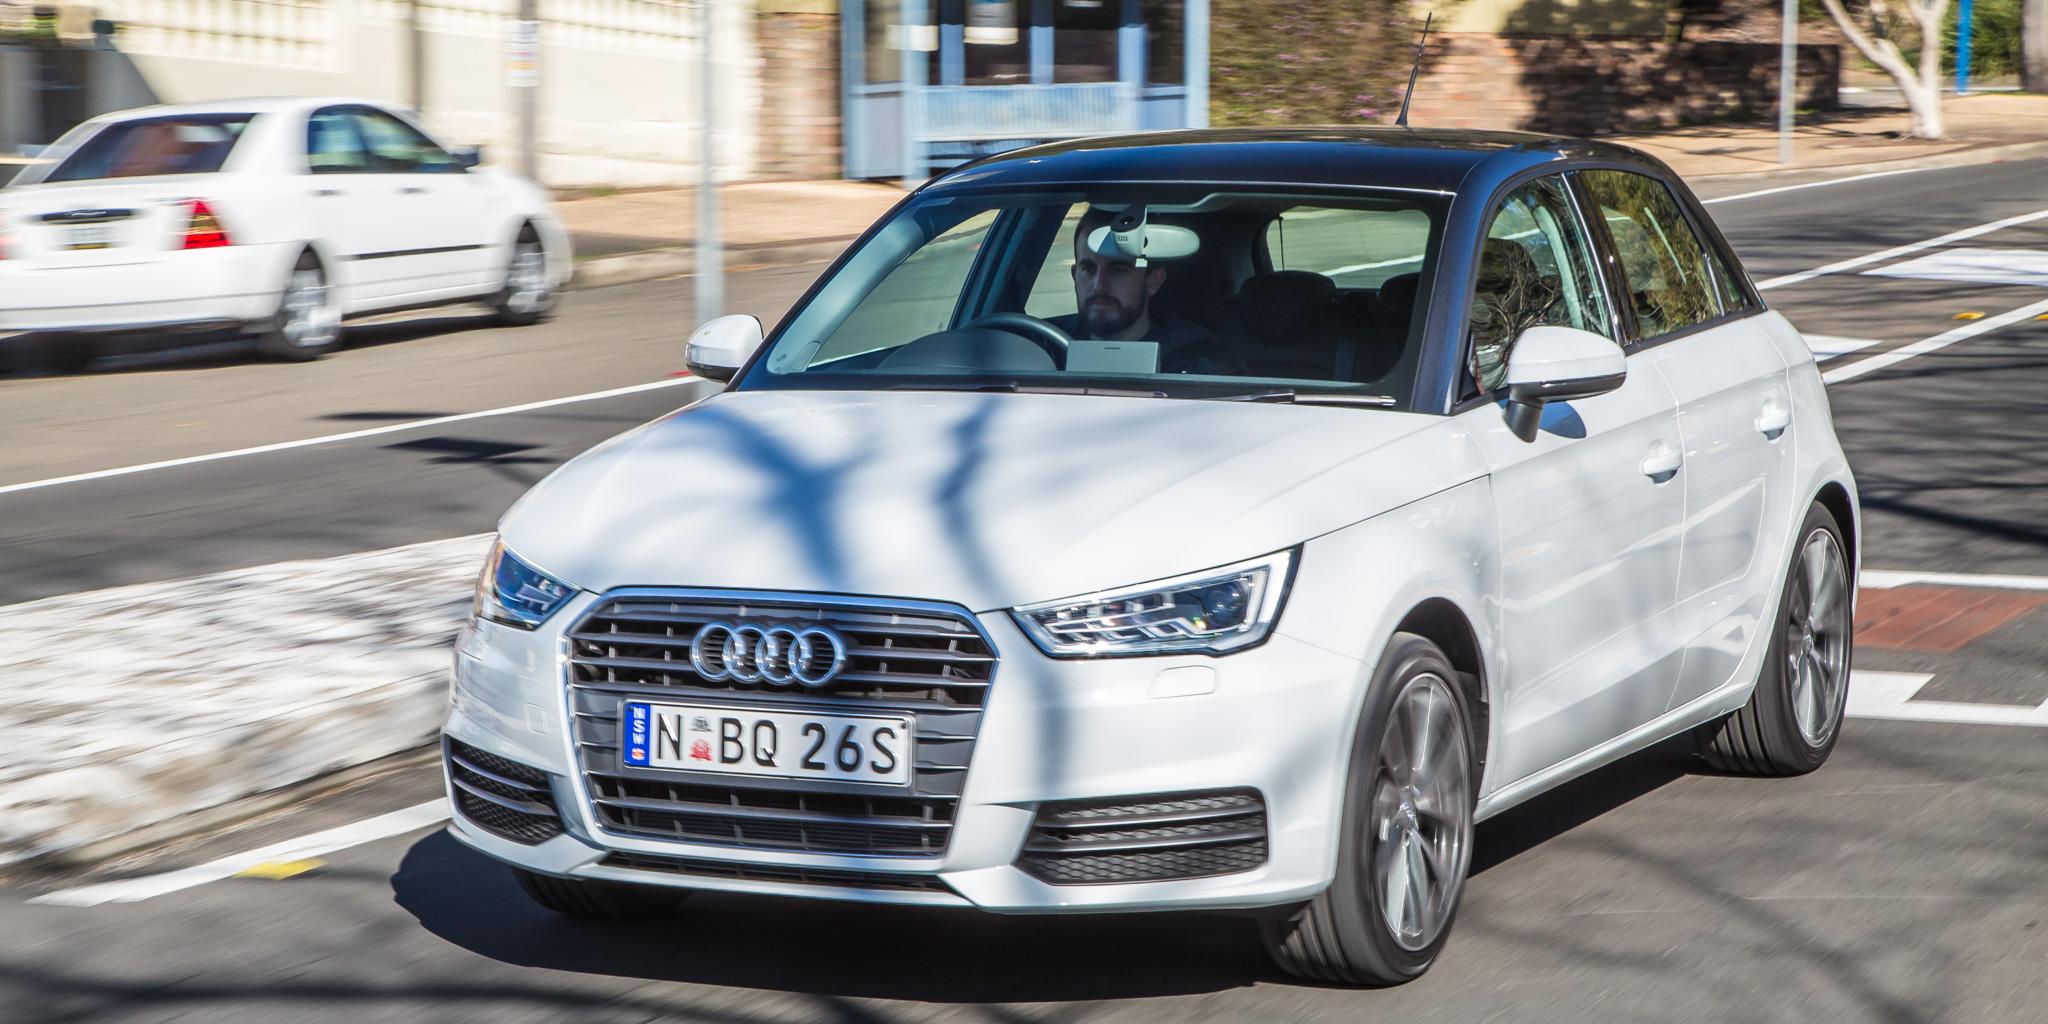 Audi A1 Sportback 1.0 TFSI V Mini 5 Door One : Affordable